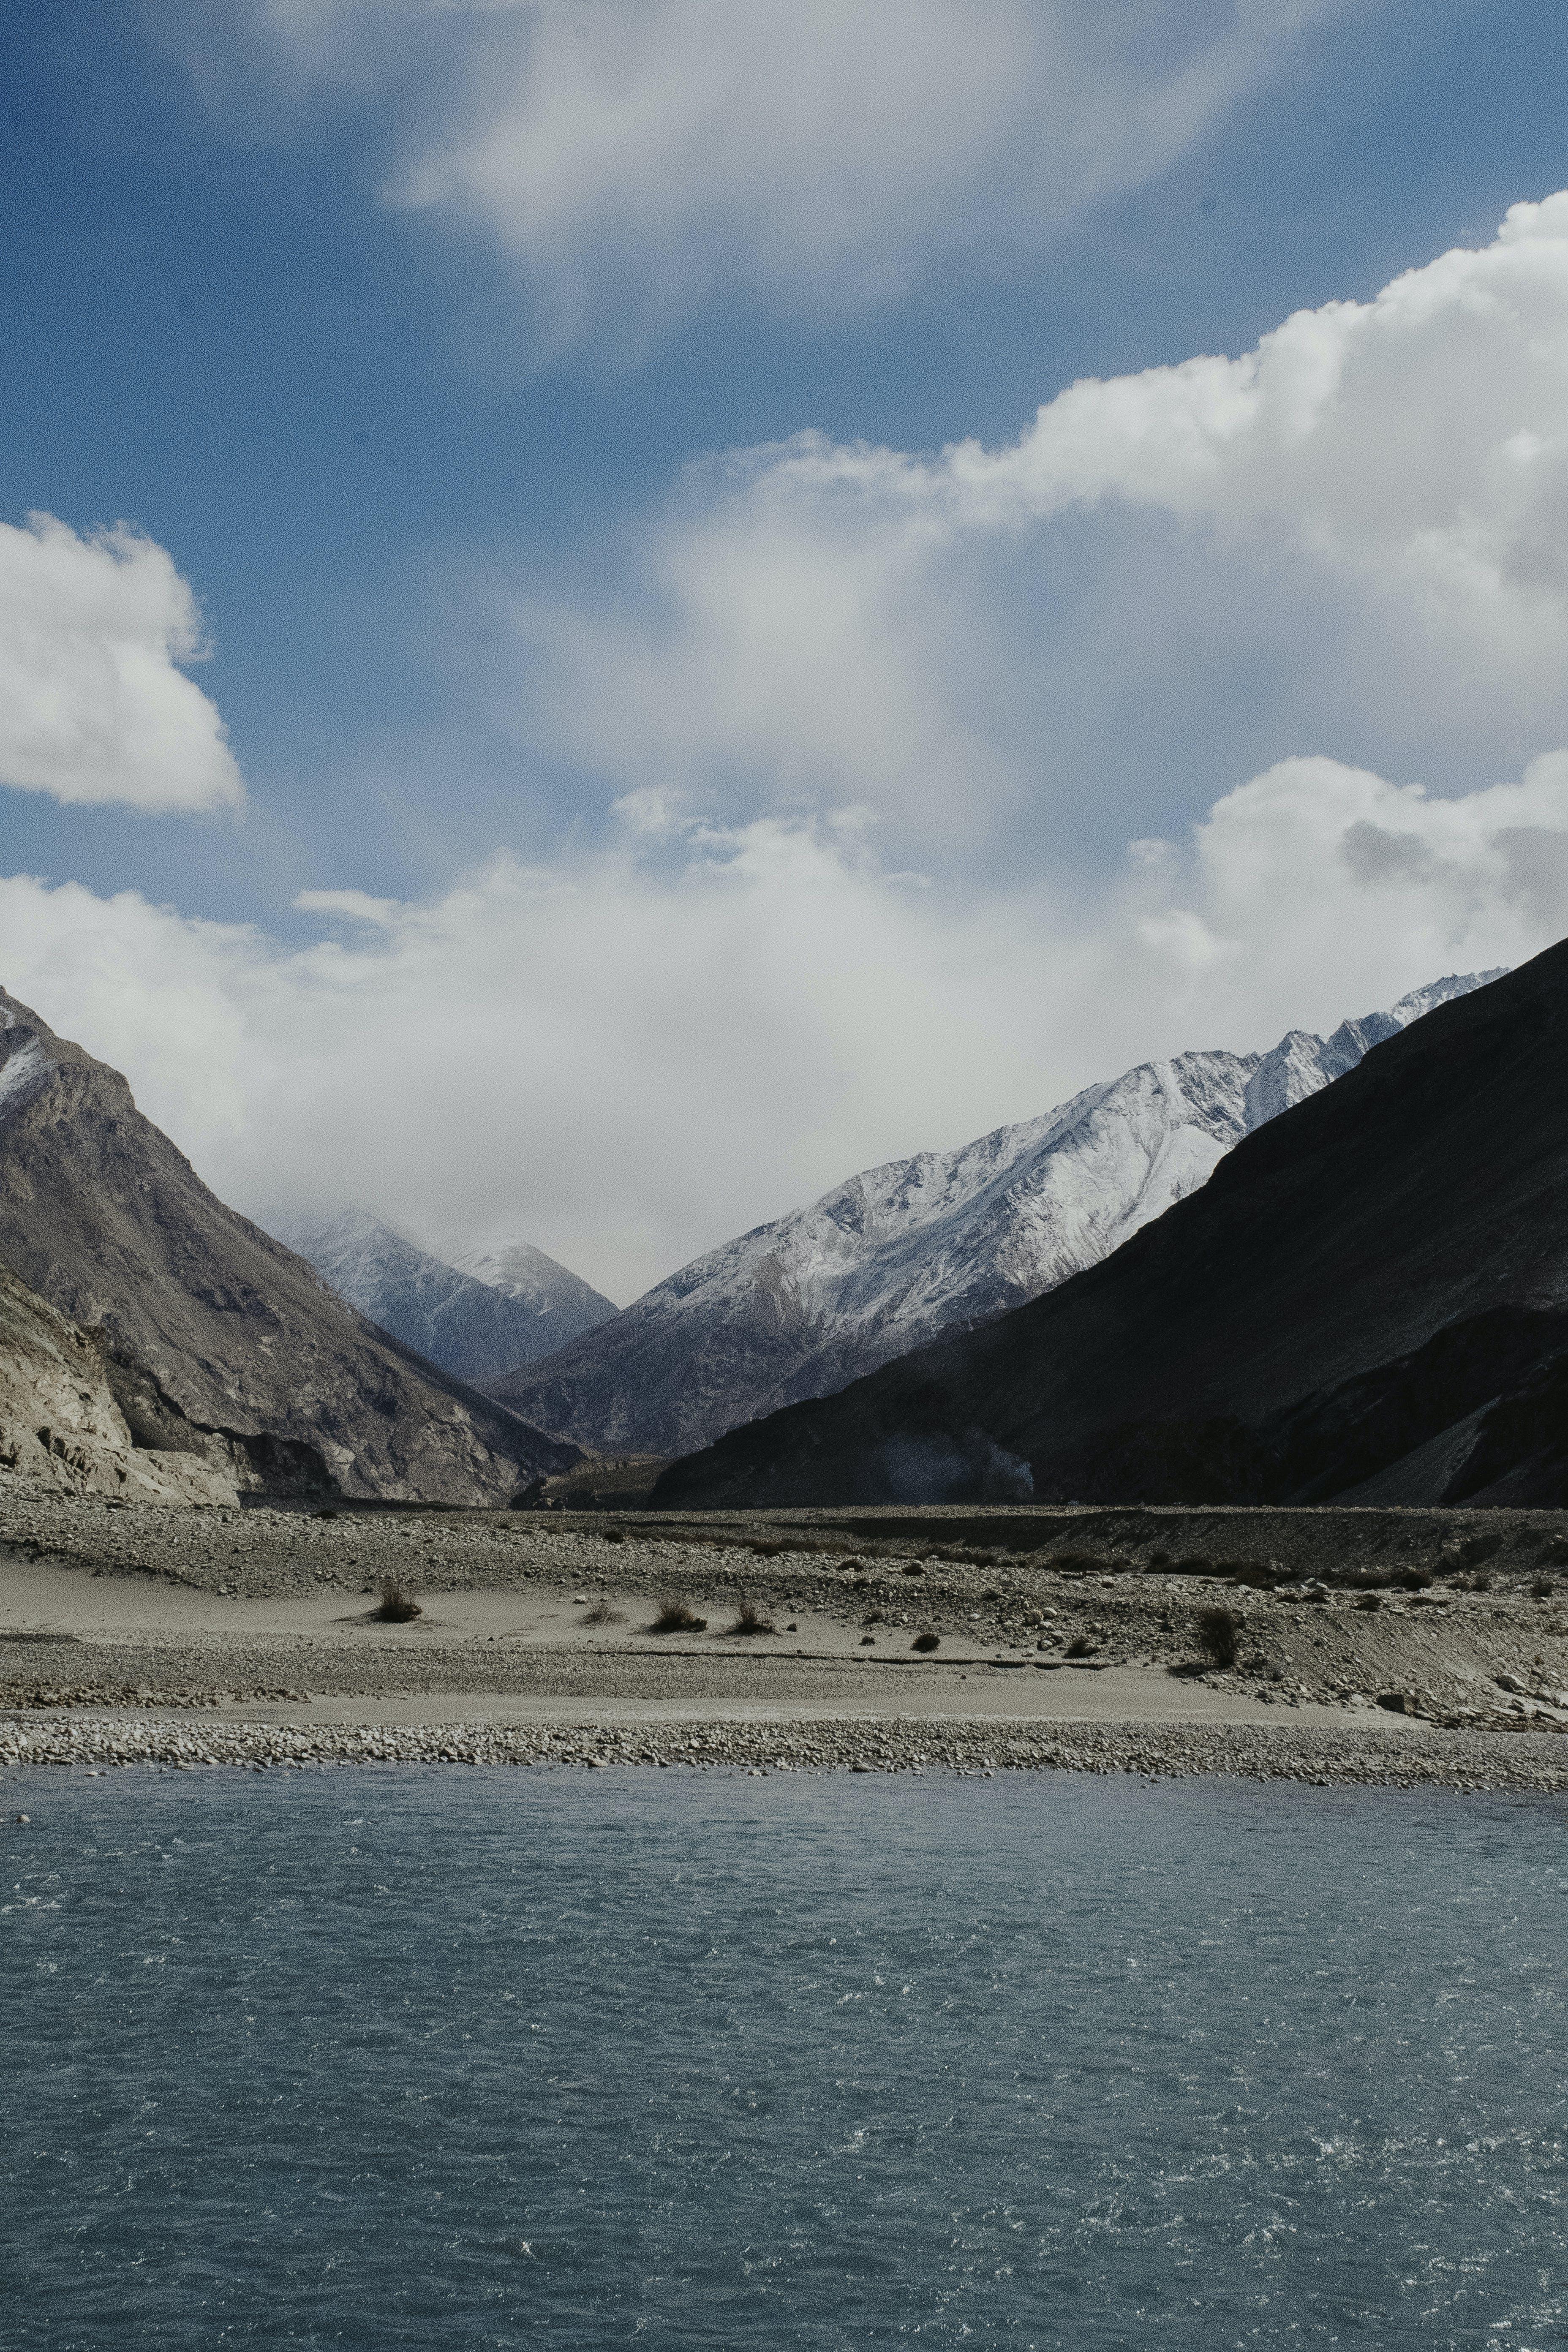 Free stock photo of beautiful, blue mountains, himalaya, india